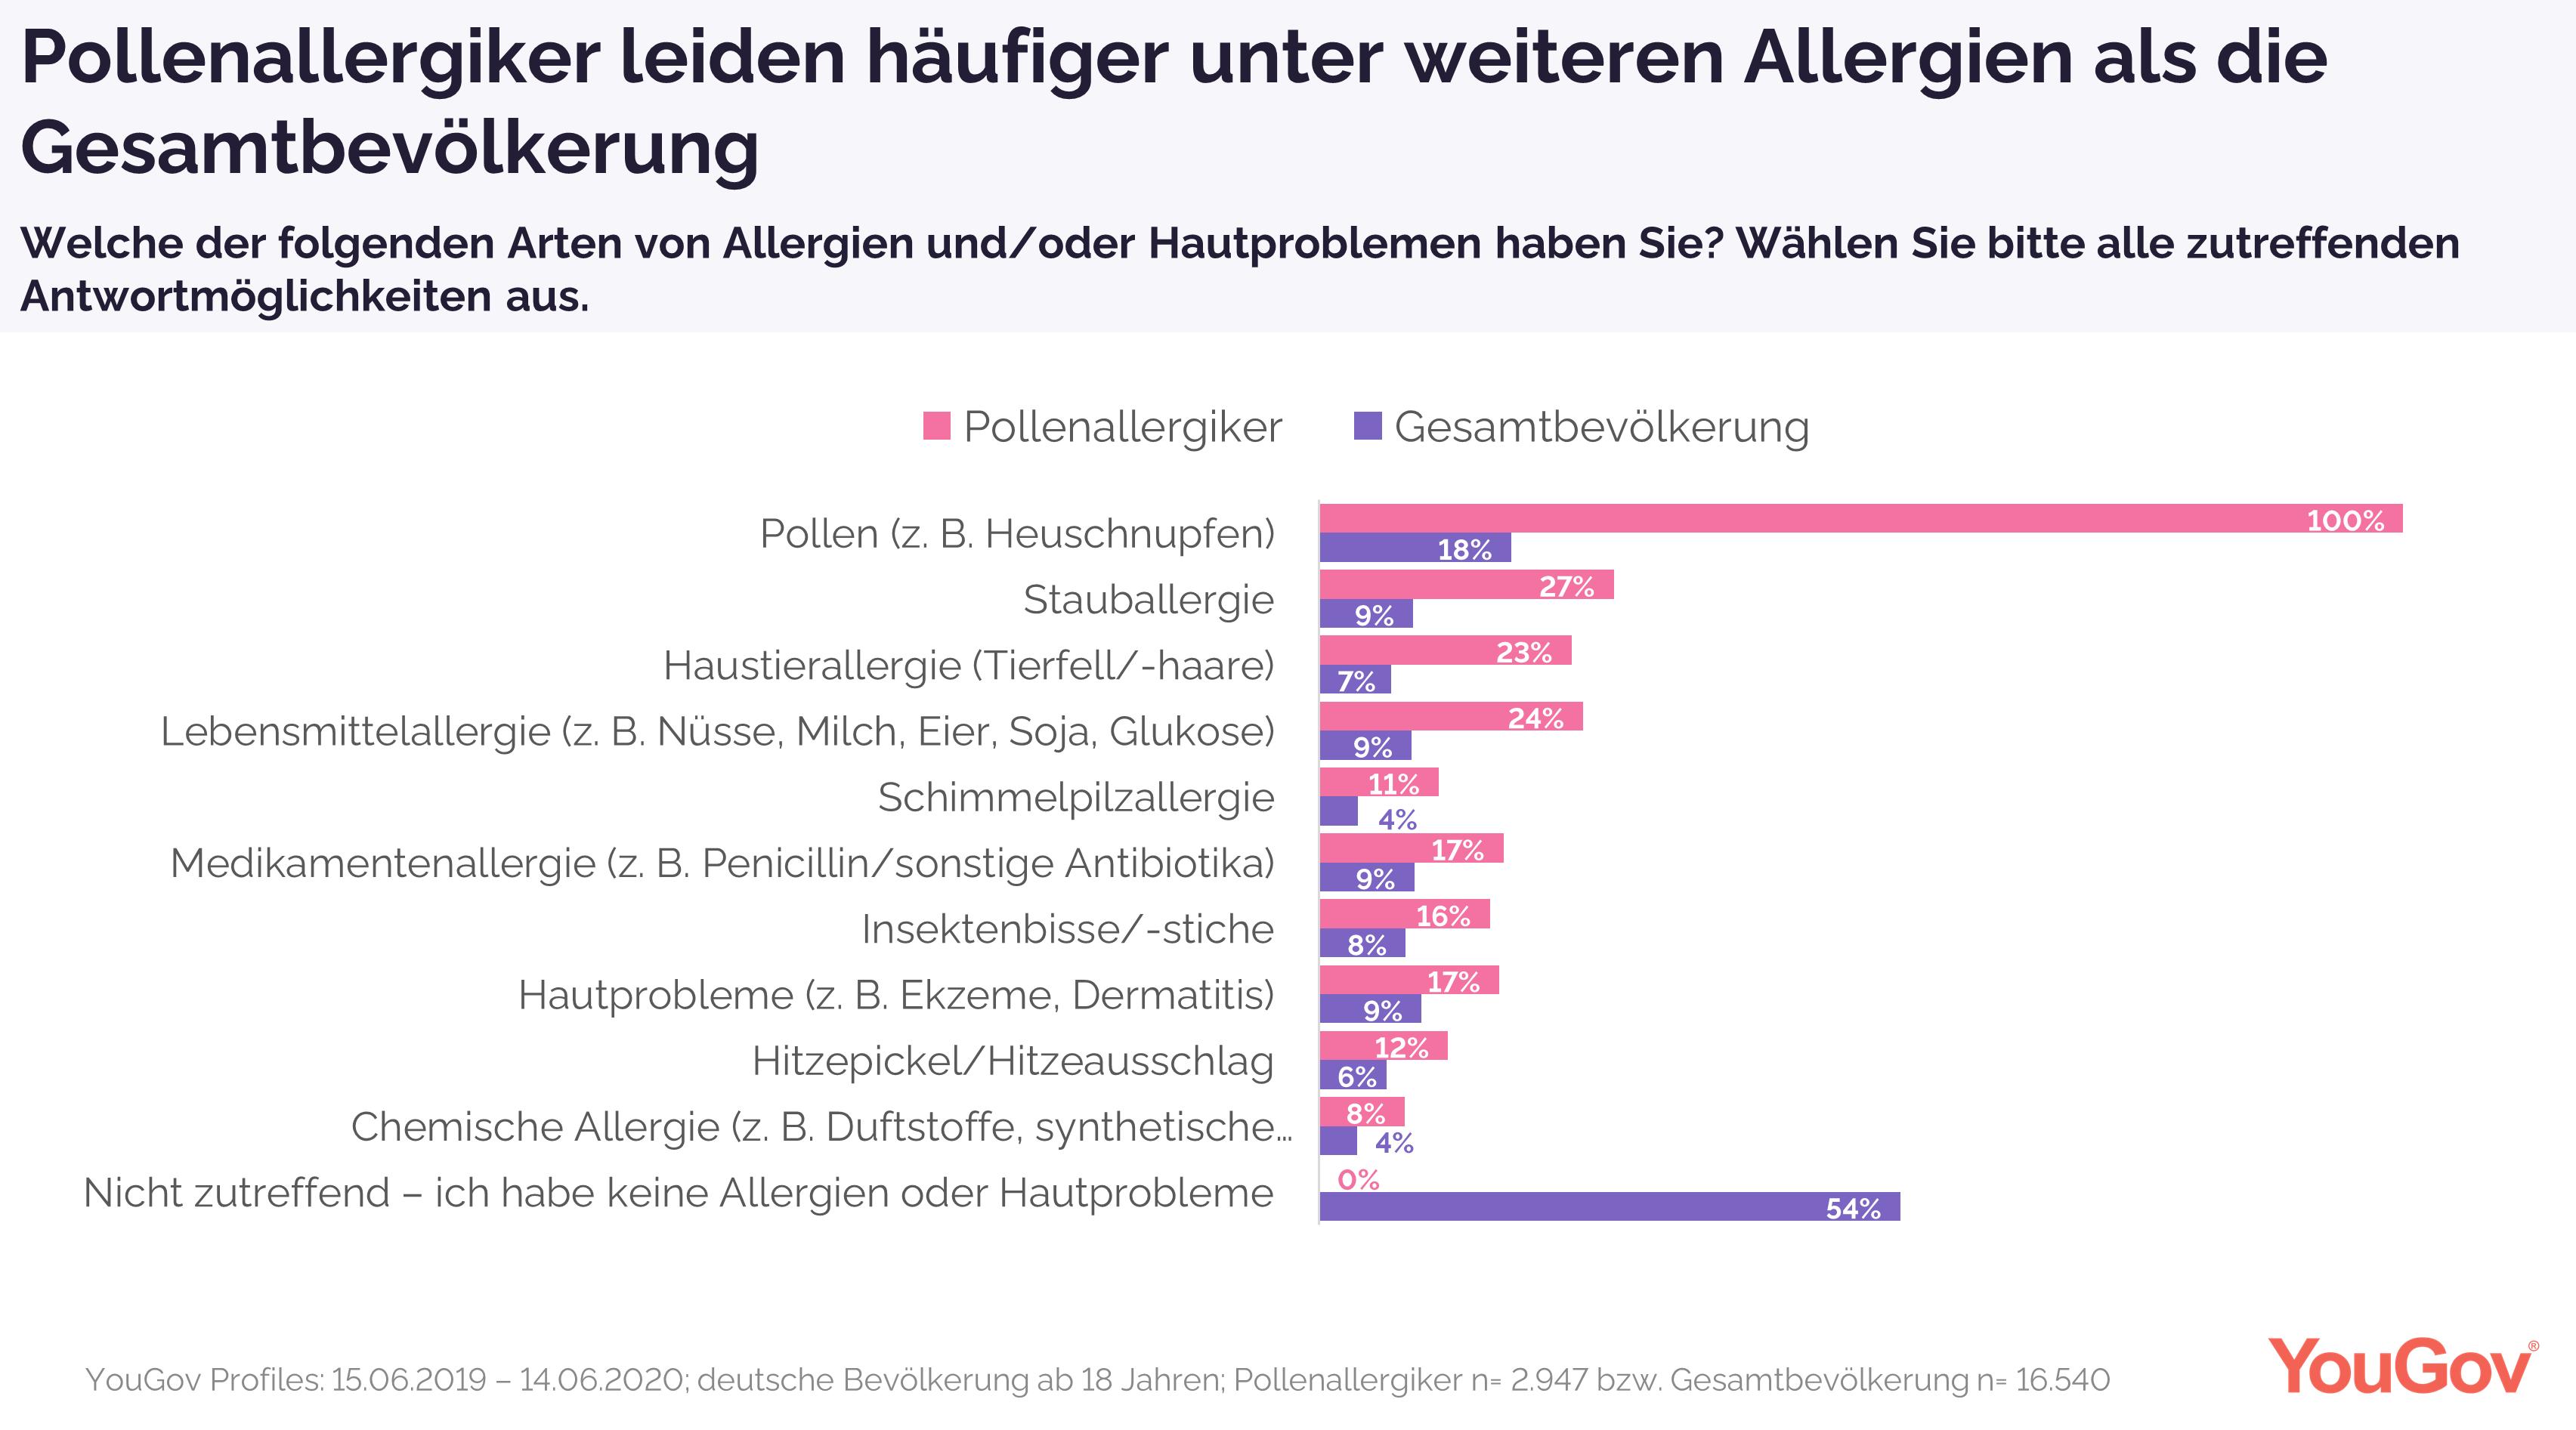 Pollenallergiker vs. Gesamtbevölkerung